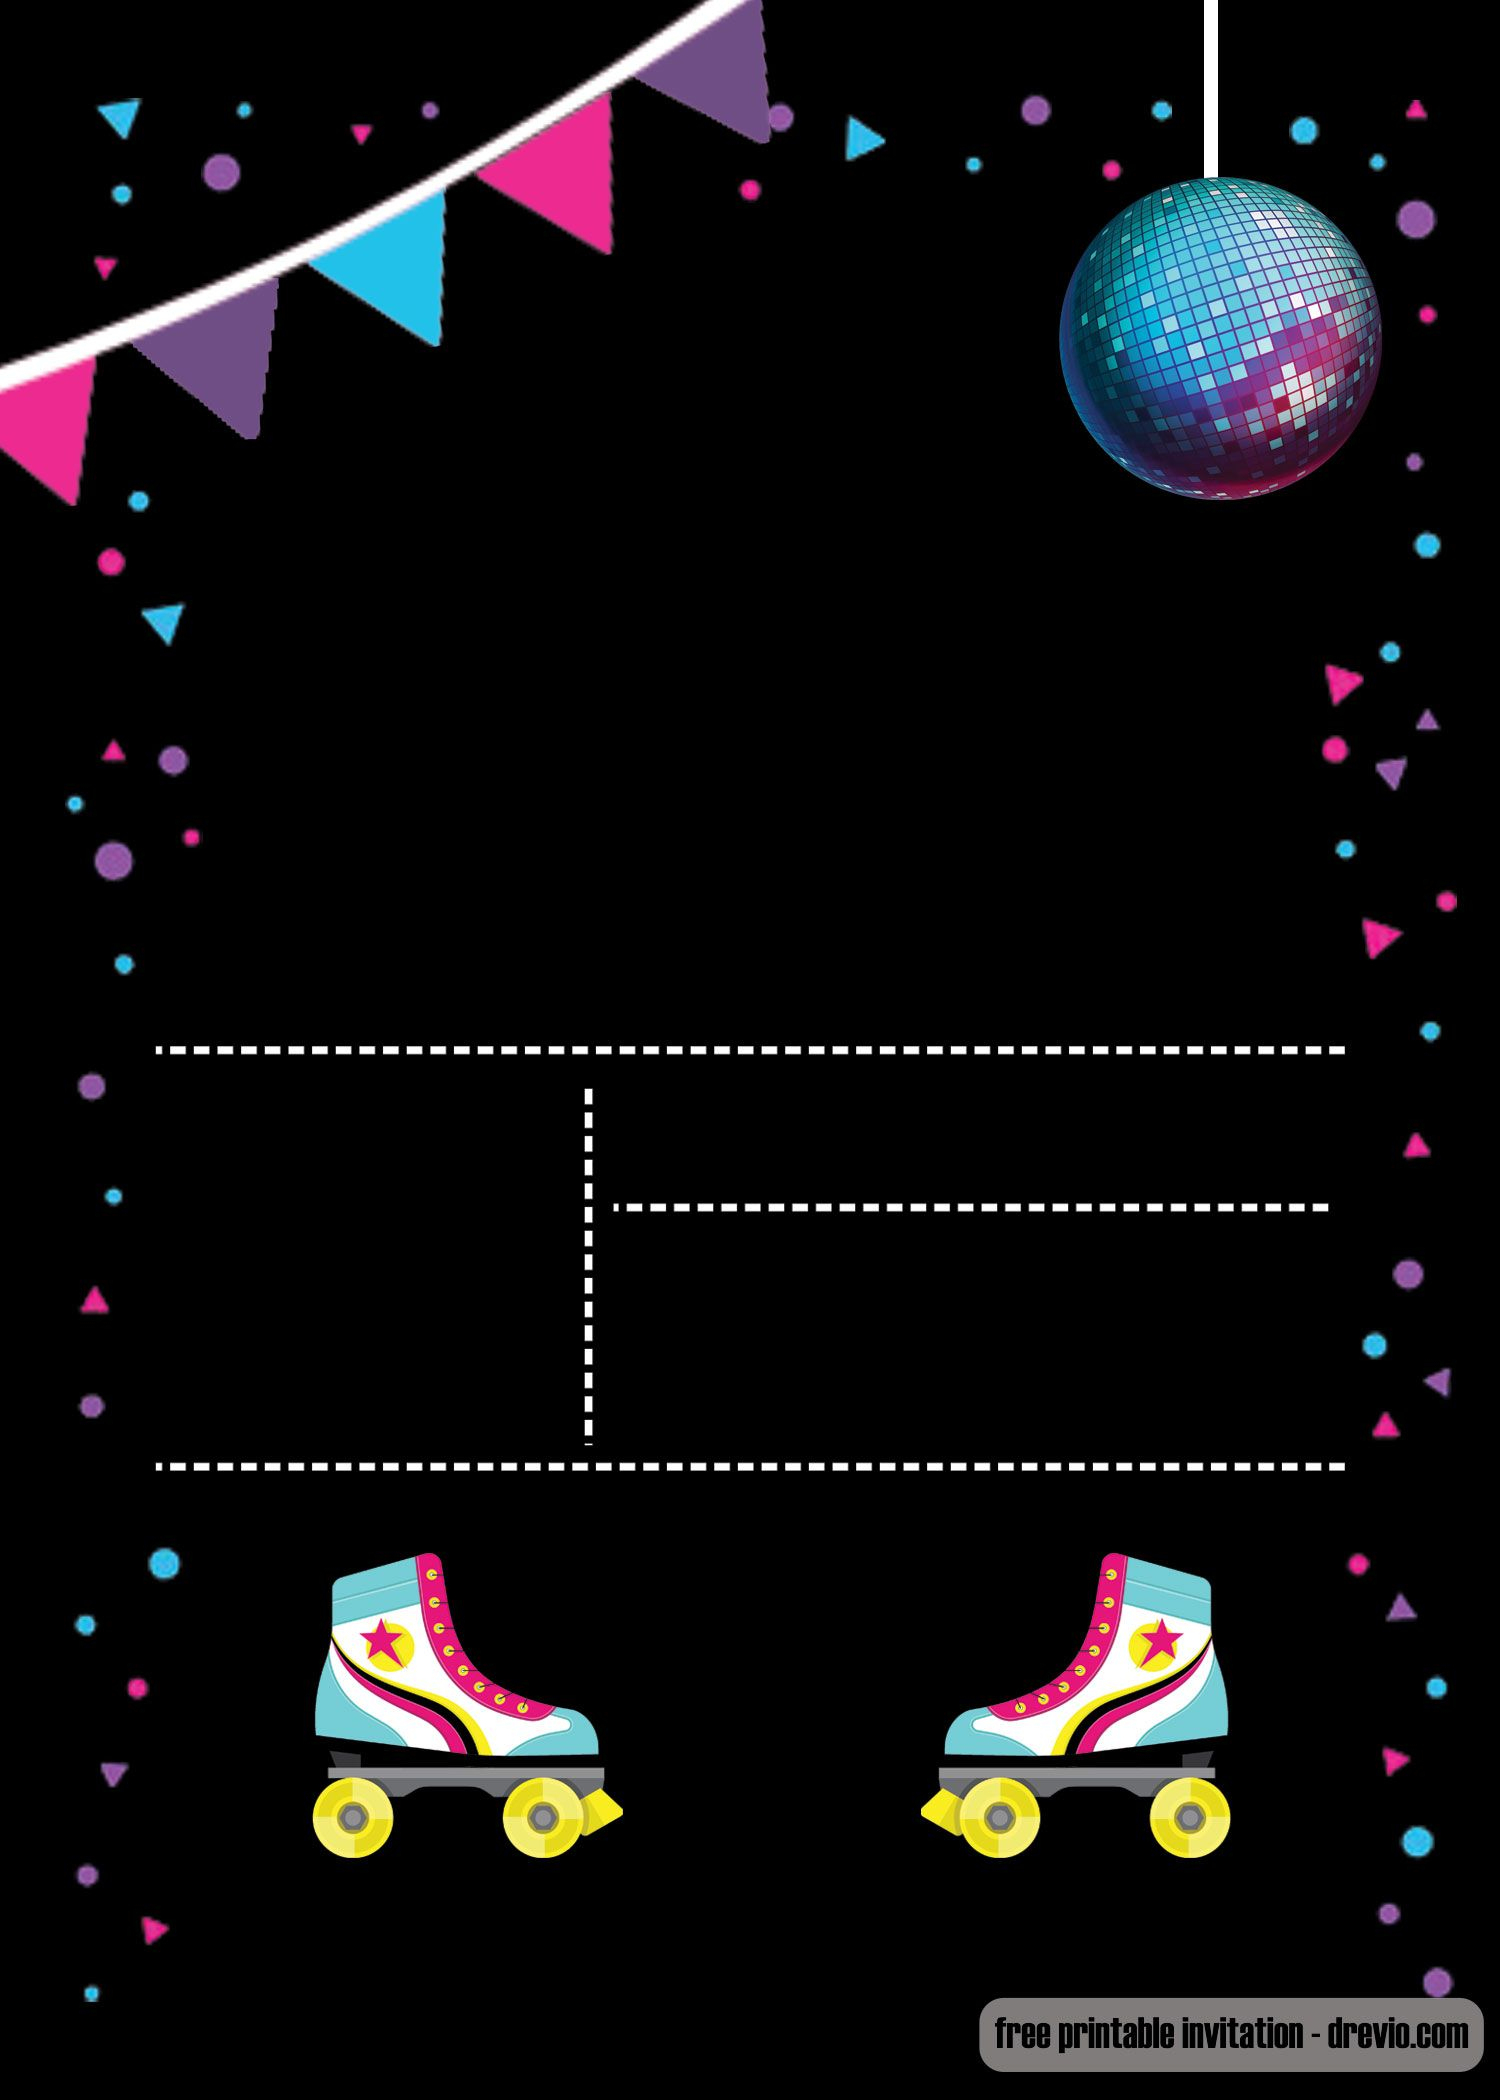 Free Printable Roller Skating Invitation | Invites | Birthday - Free Printable Skating Invitations